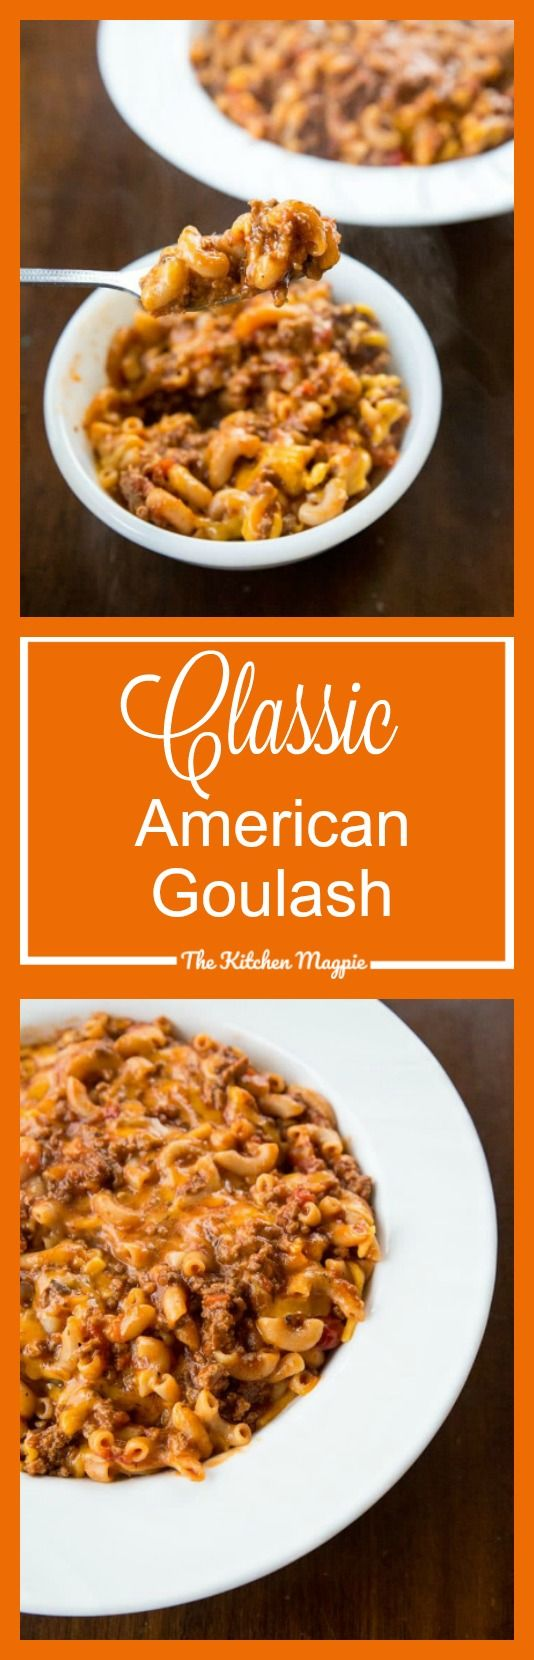 Classic American Goulash